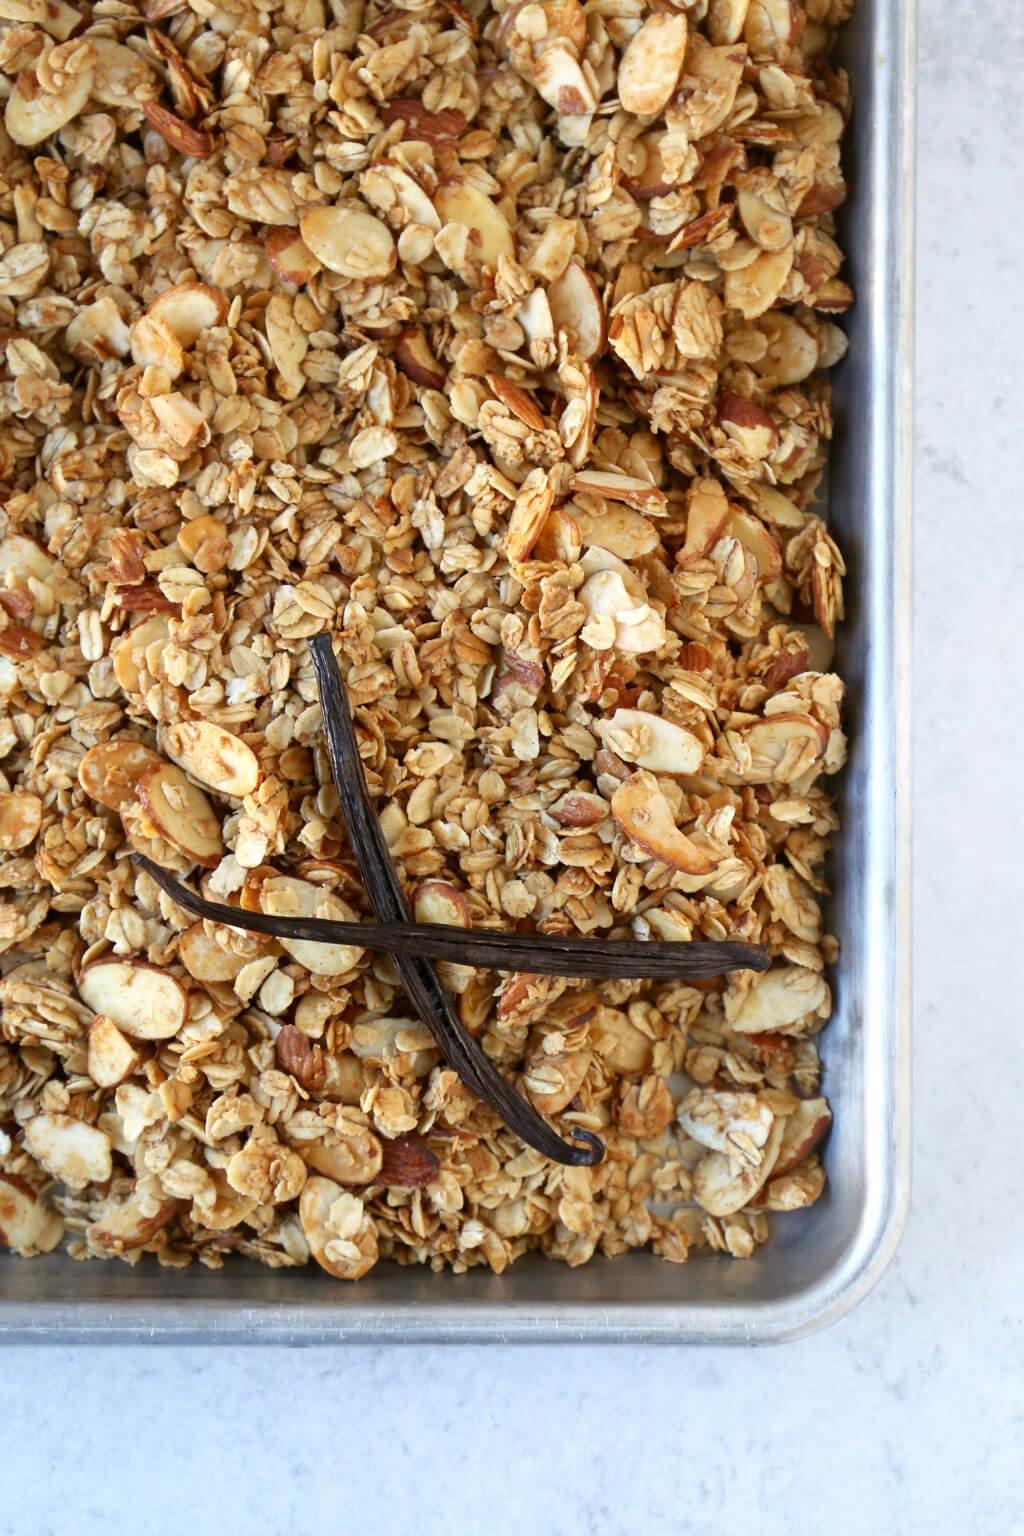 a sheet pan of granola drying